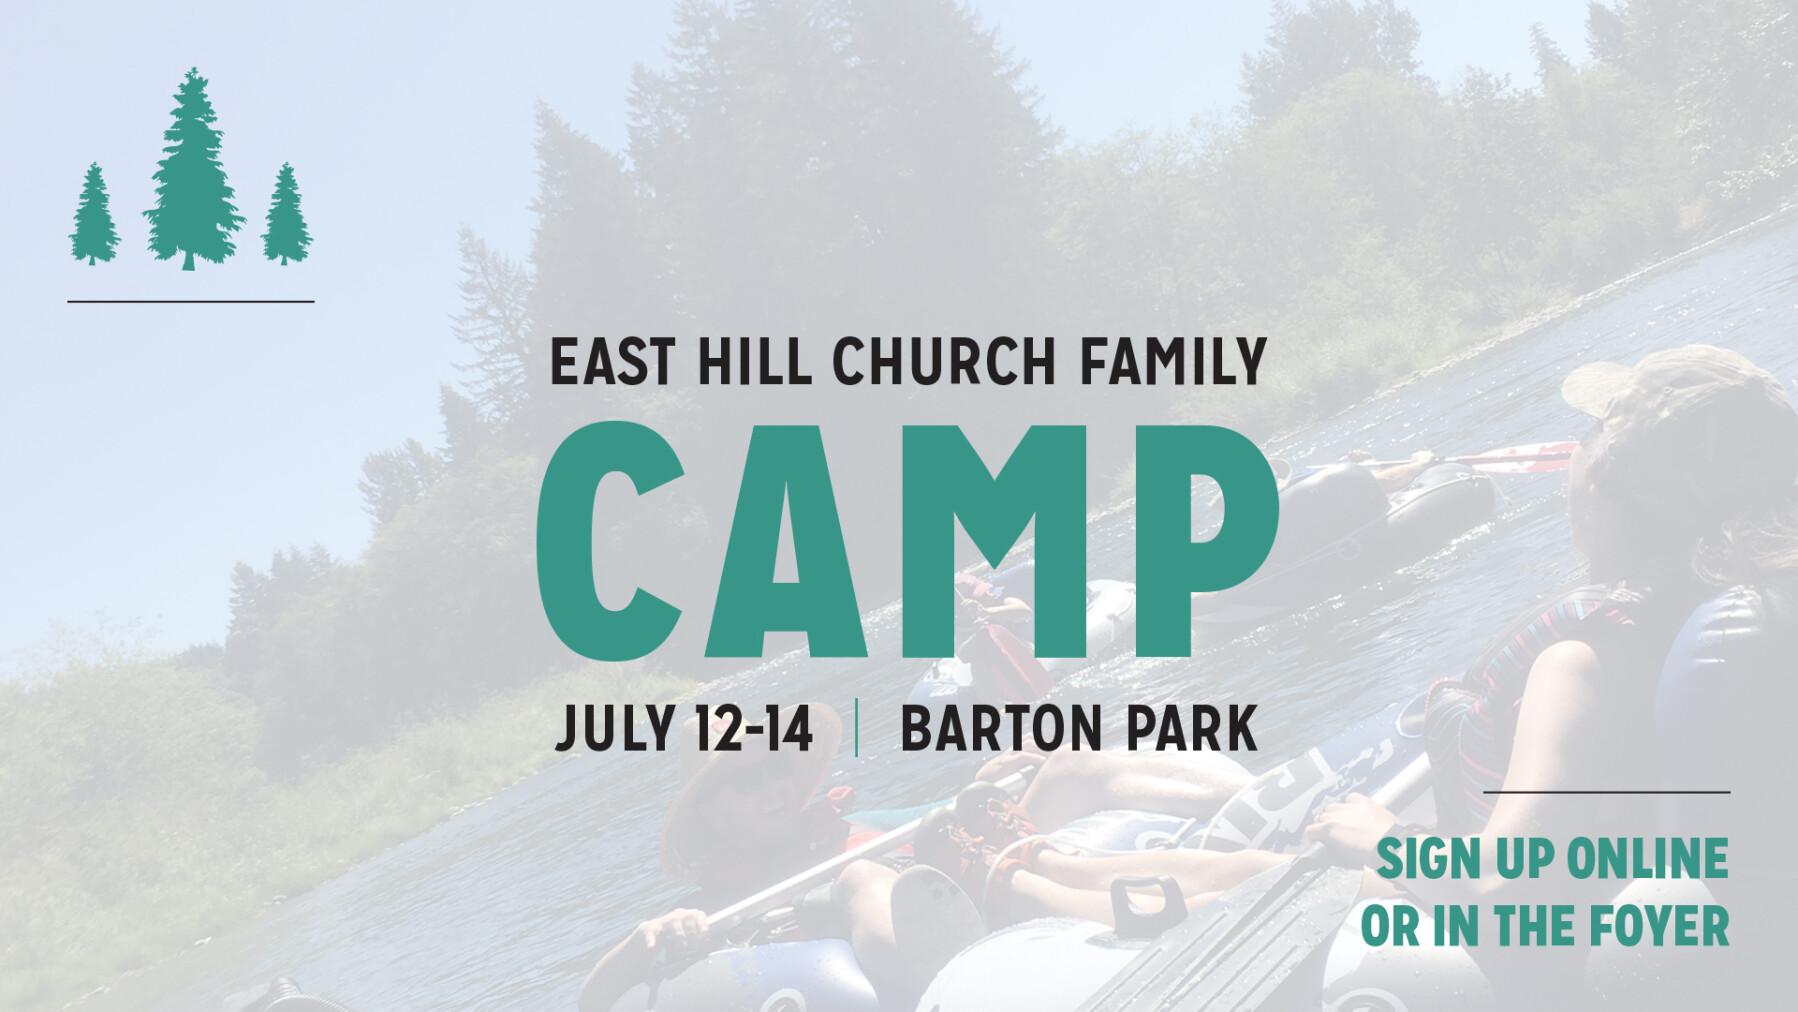 East Hill Church Family Camp